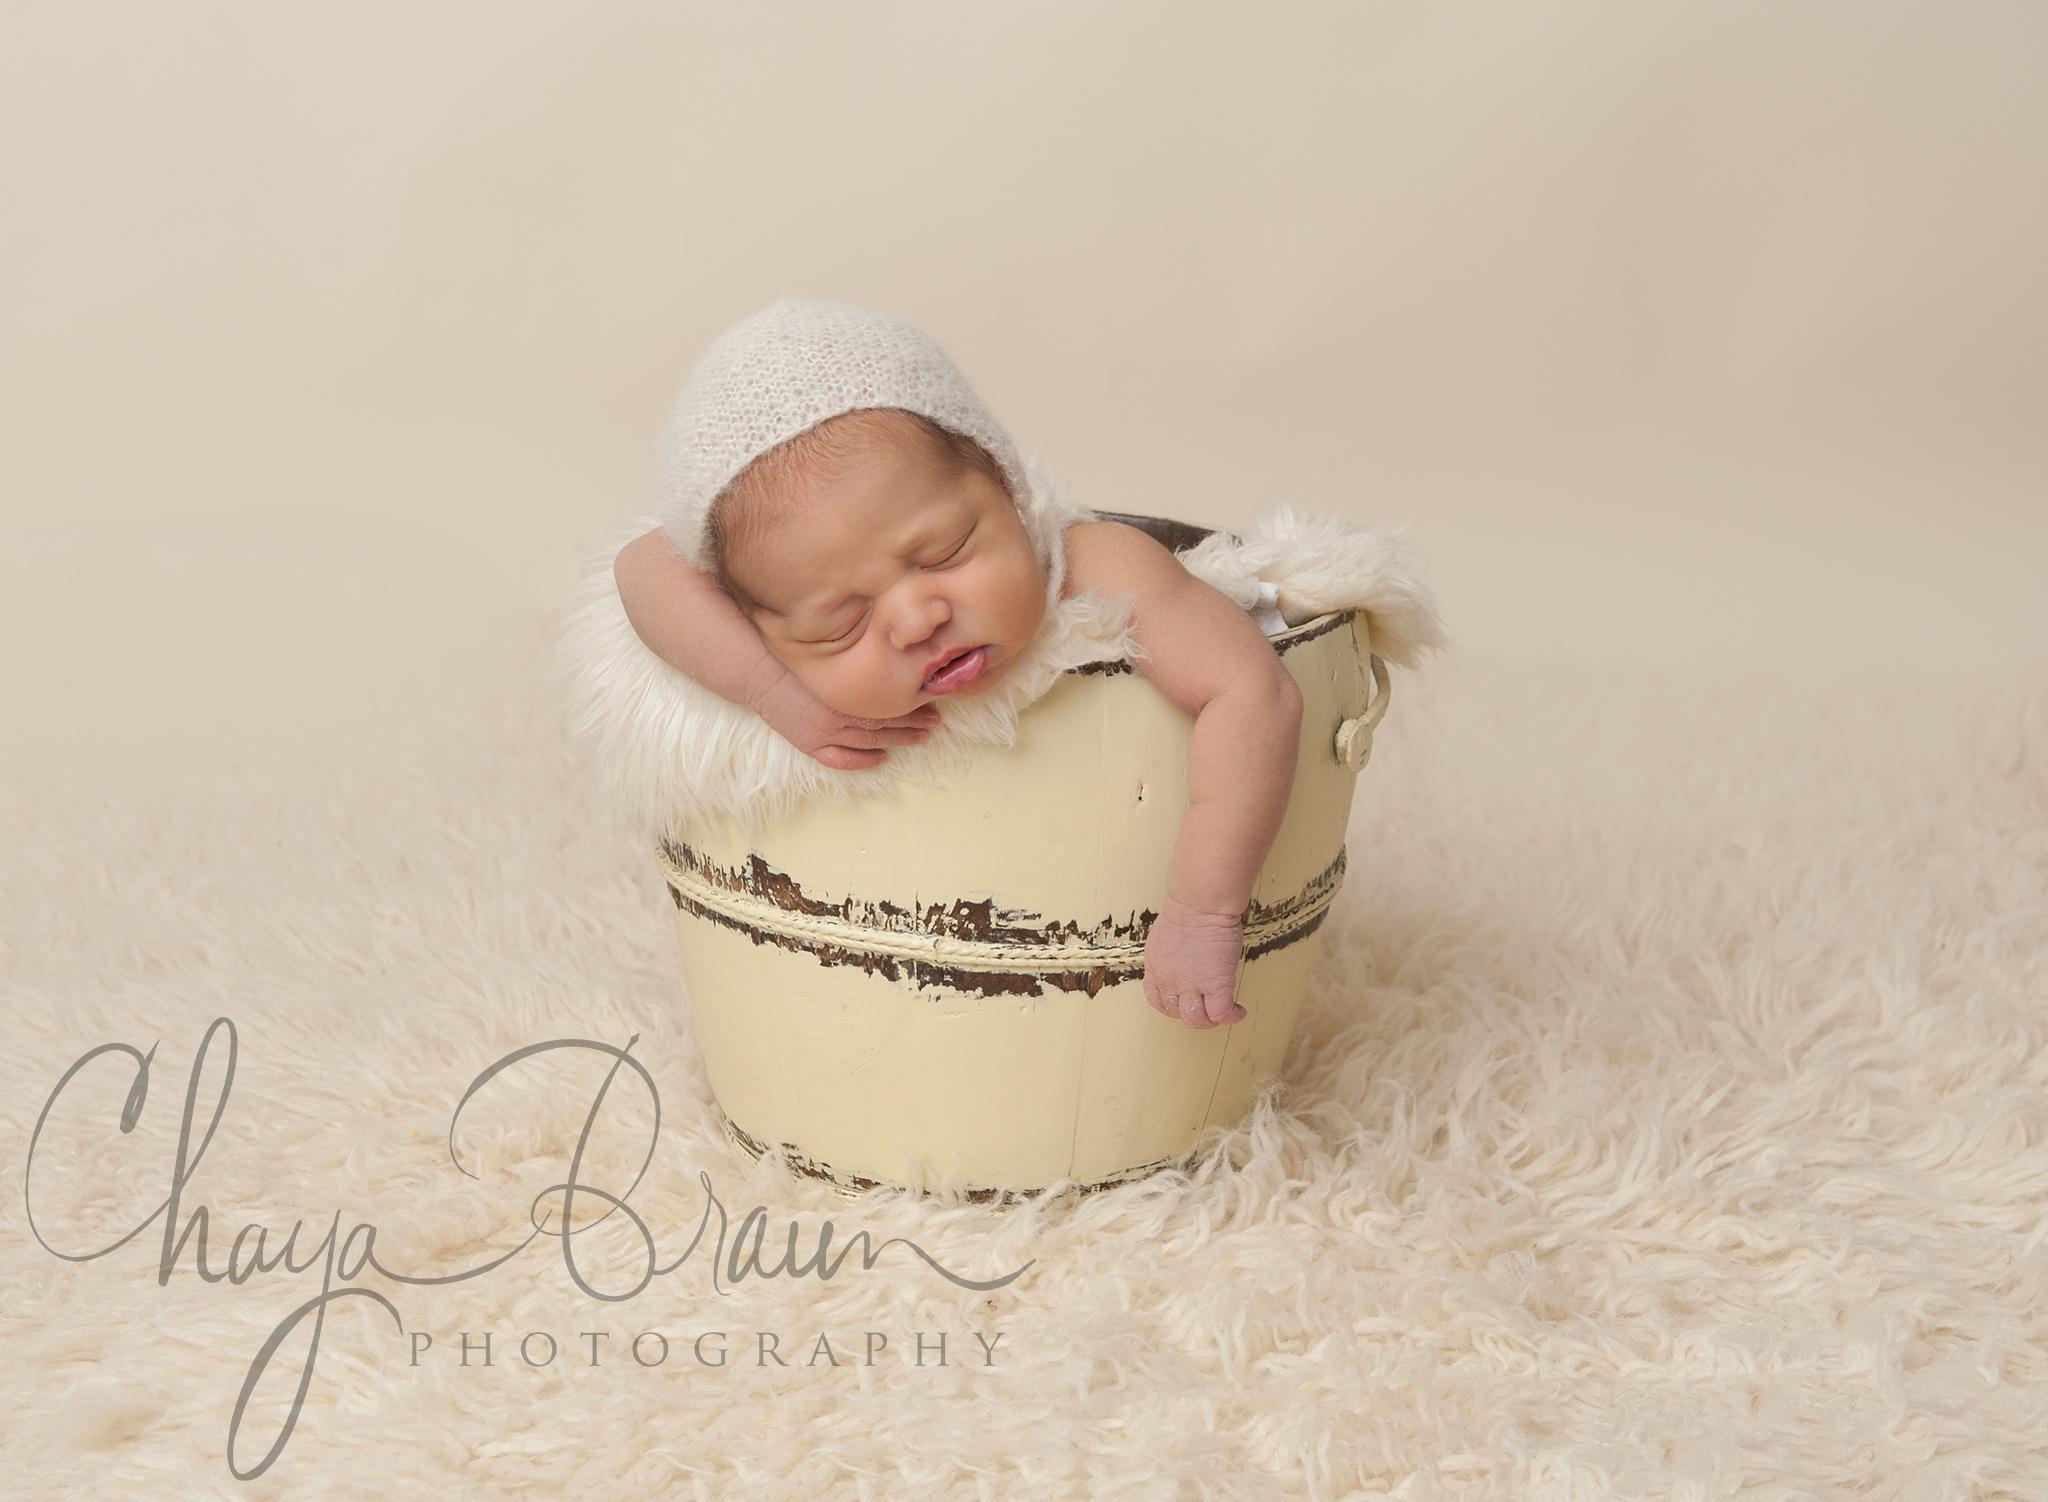 sleeping newborn baby in a bucket